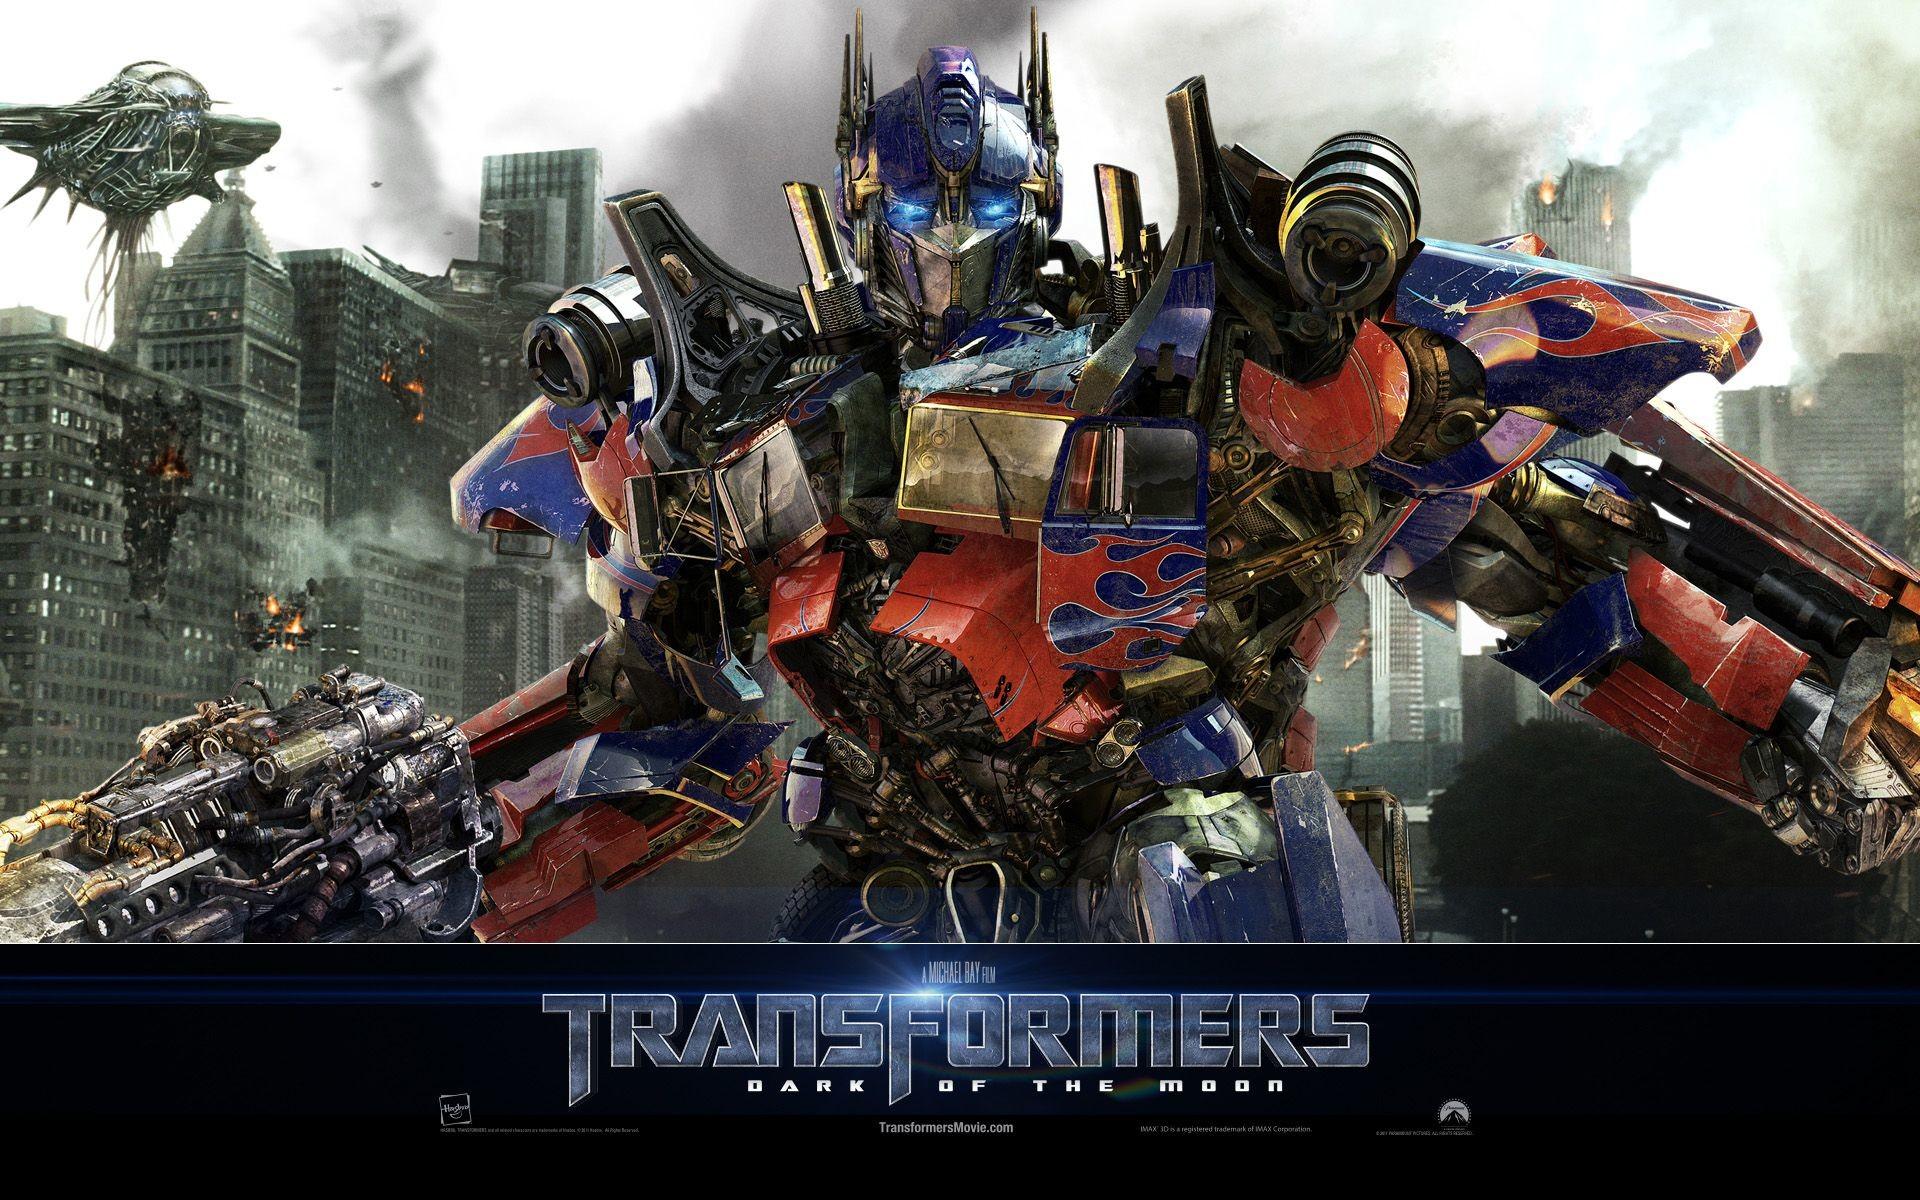 Transformers Optimus Prime Wallpapers Gallery - Transformers Dark Of The Moon Wallpaper Optimus Prime - HD Wallpaper